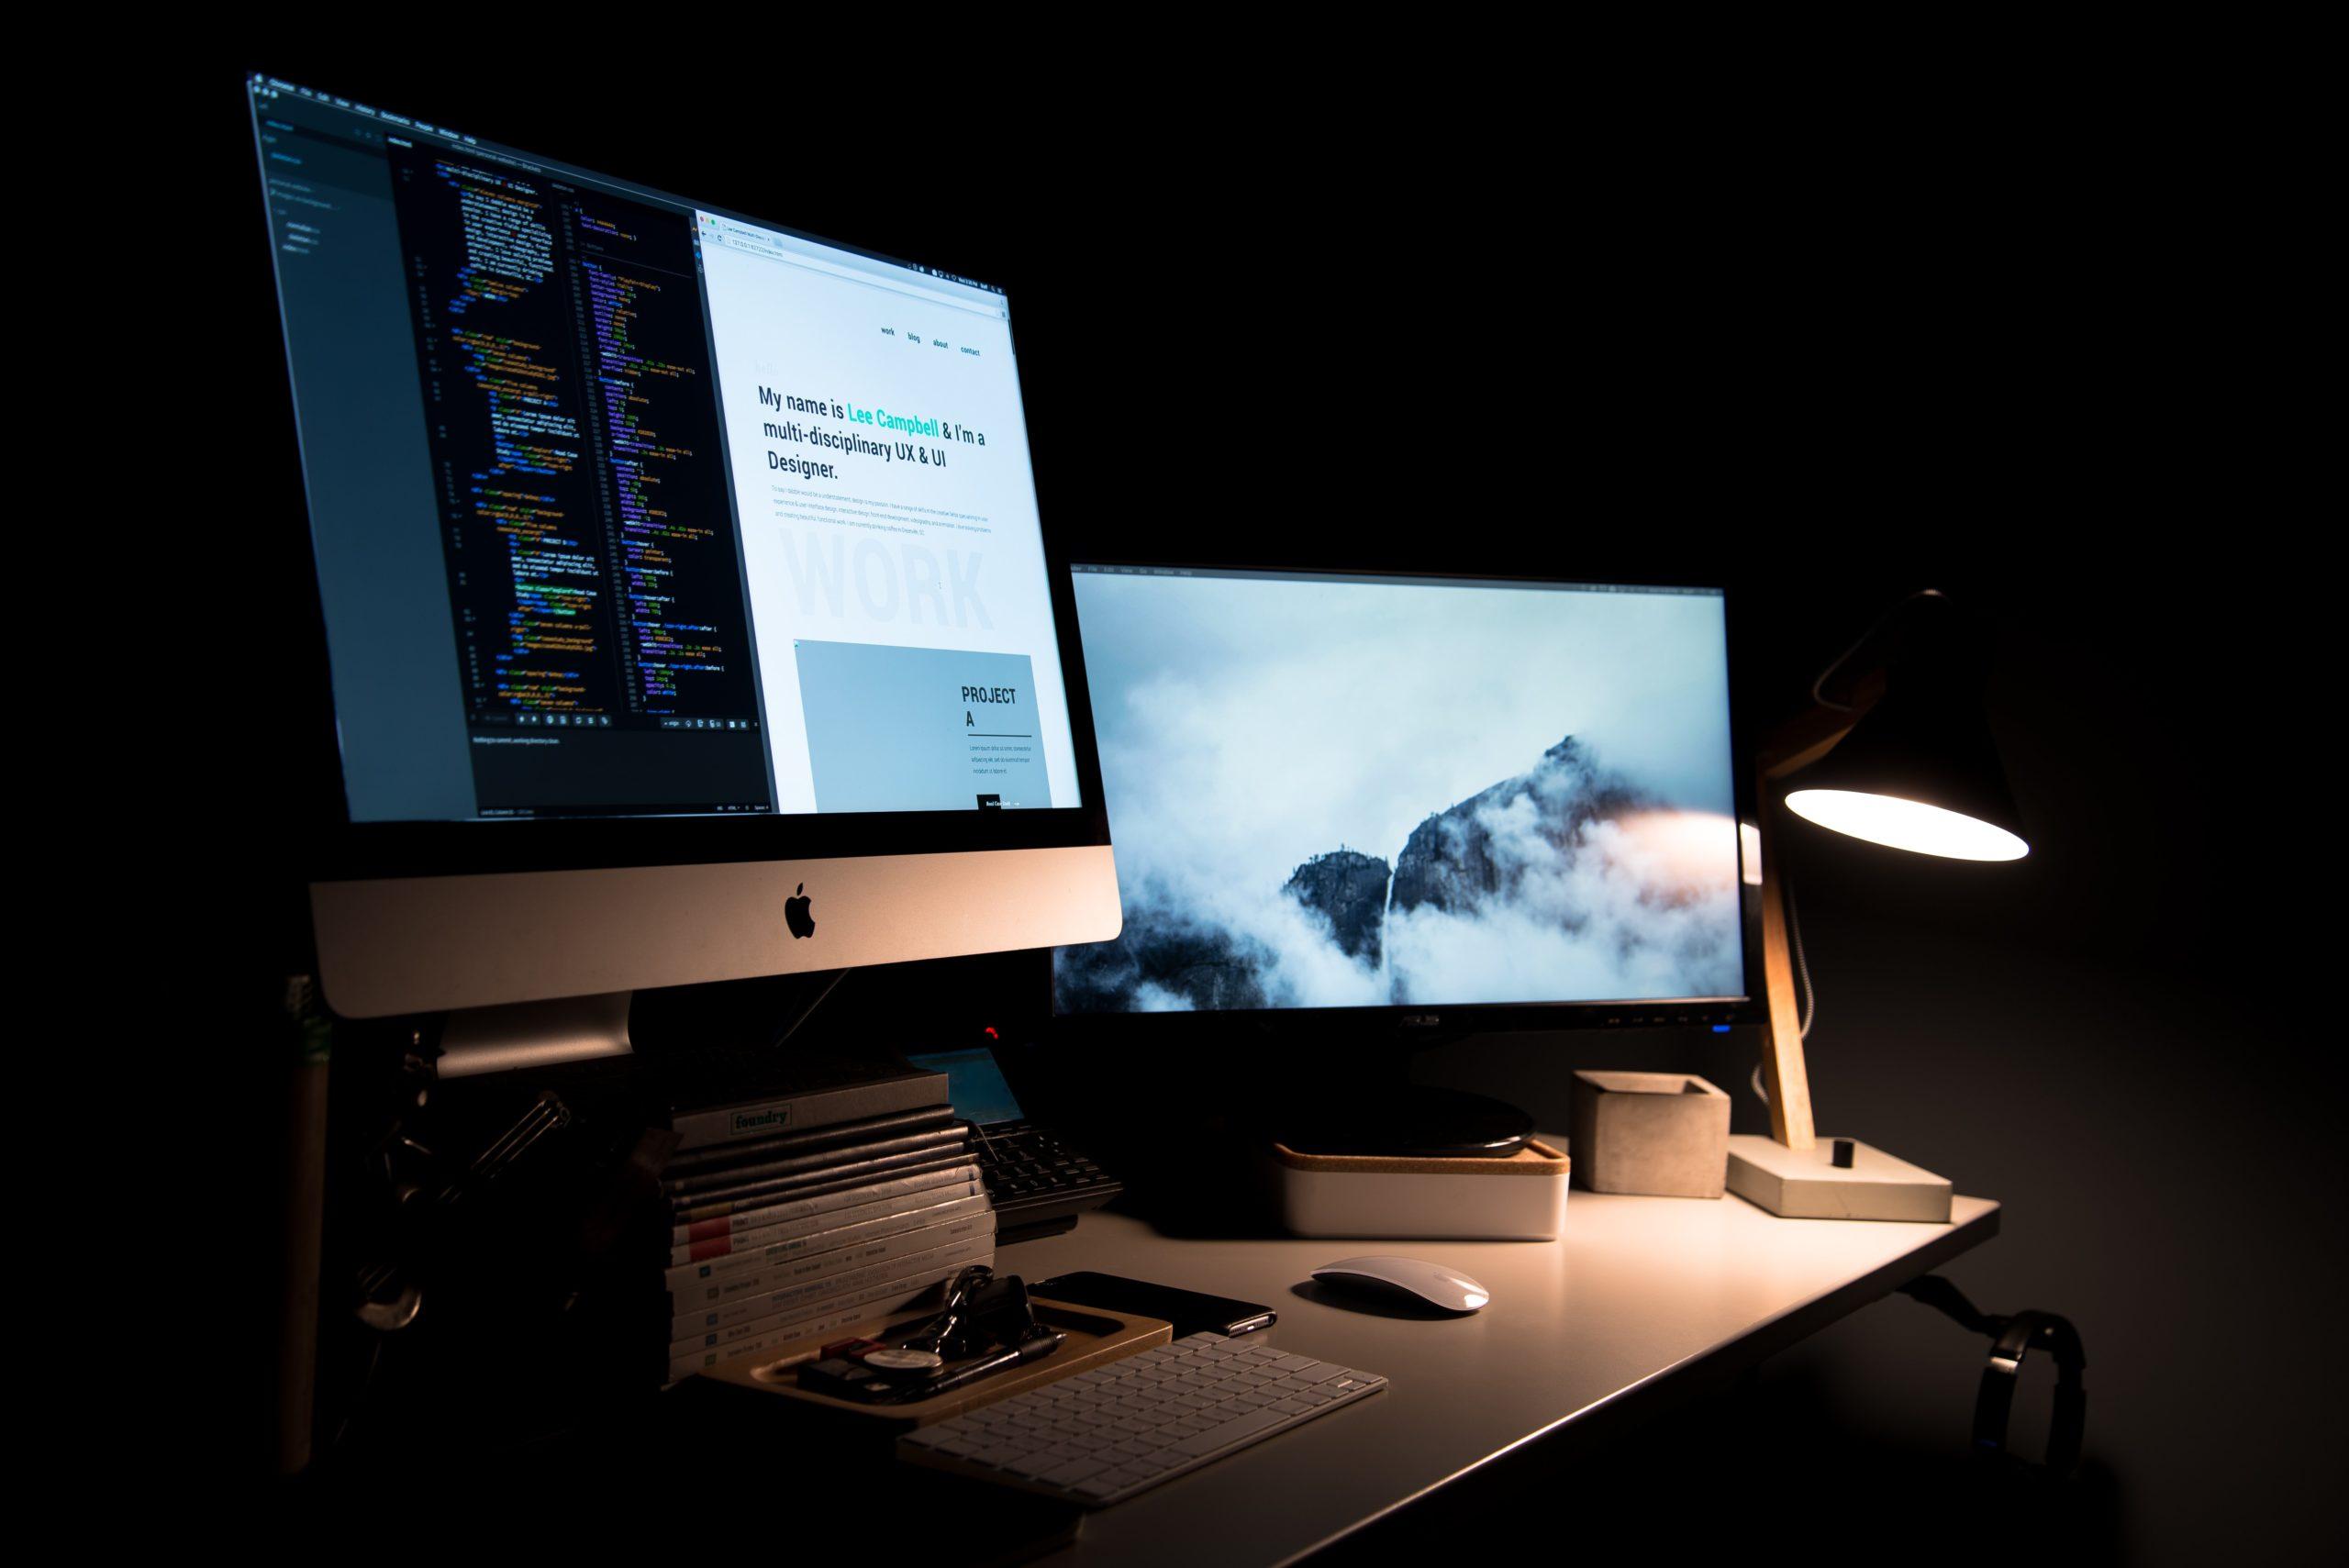 iMac Screen Showing Website Design and Backend Web Development Coding